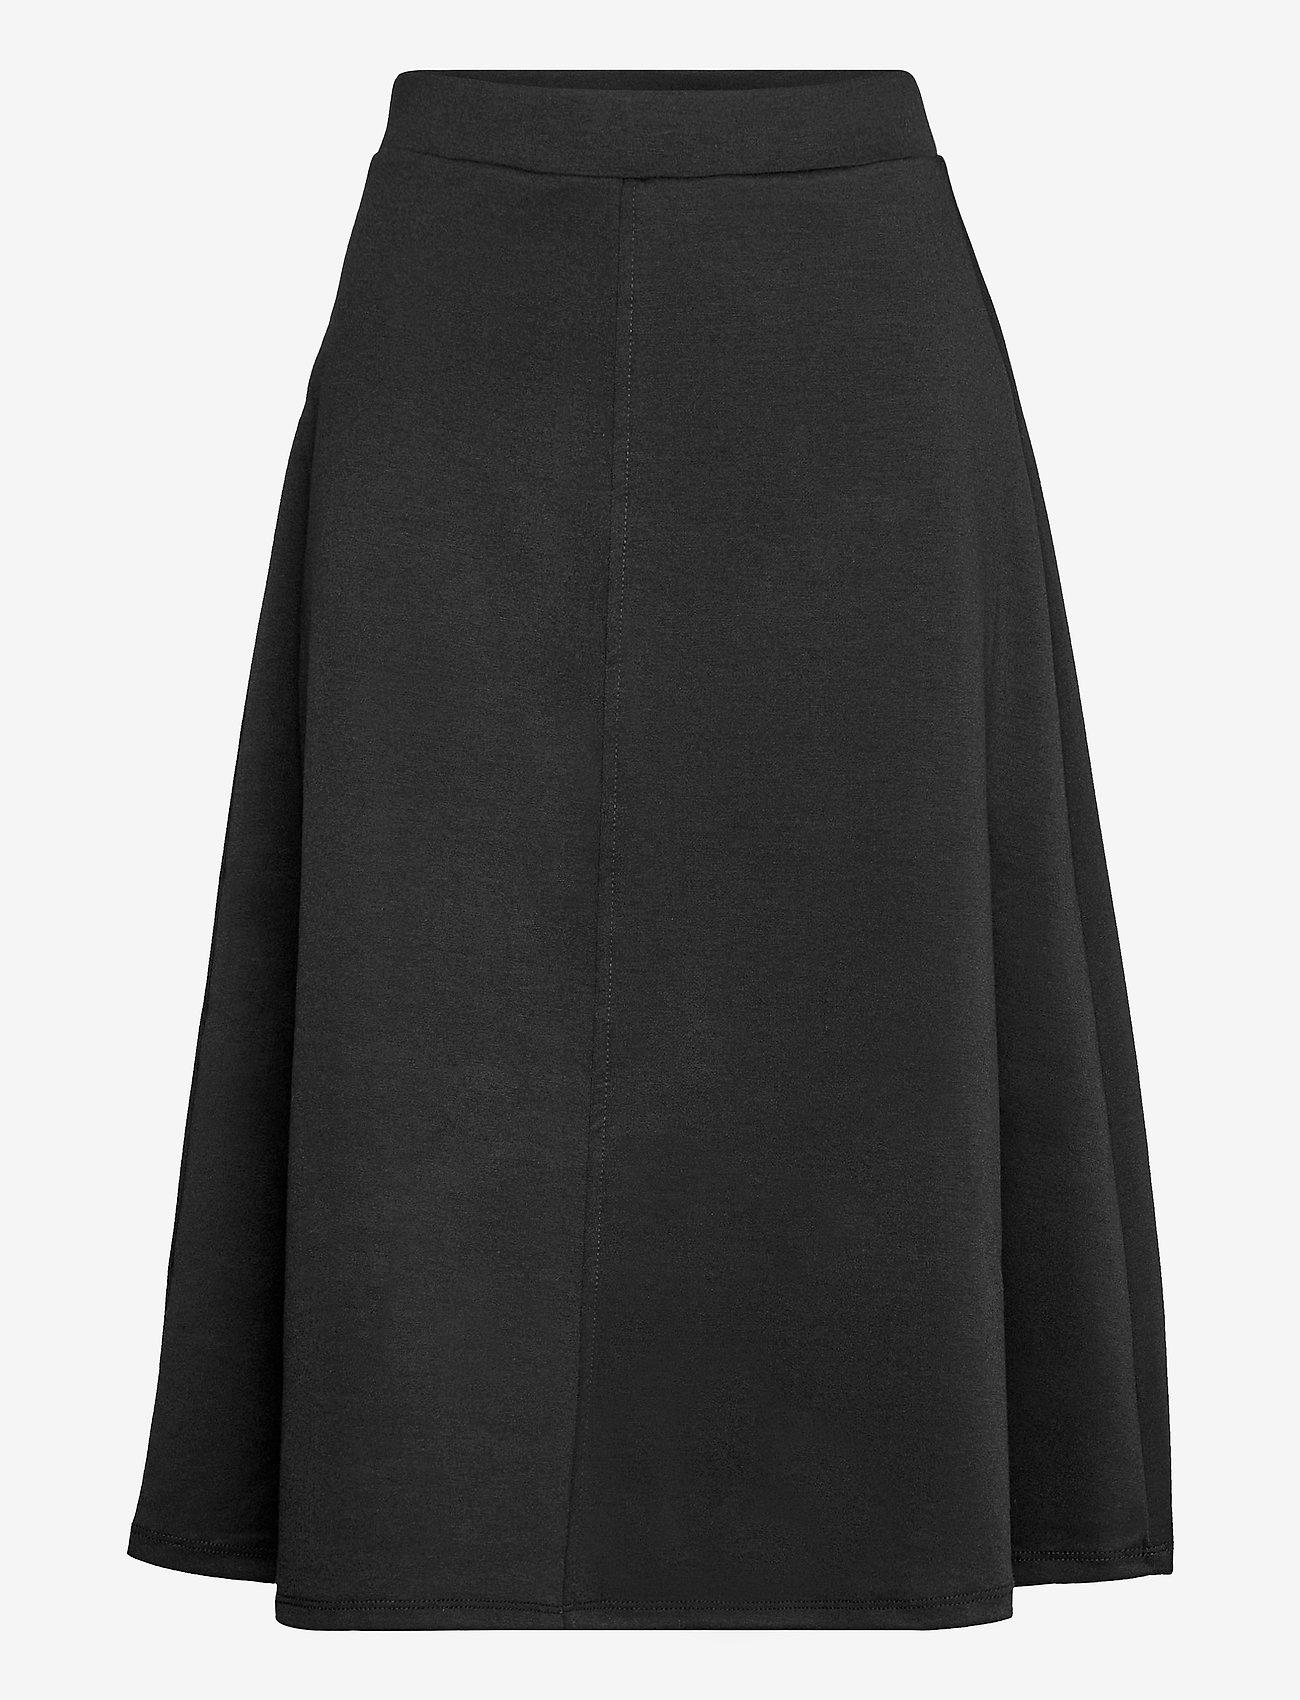 Object - OBJSAVA MW SKIRT - midi skirts - black - 0